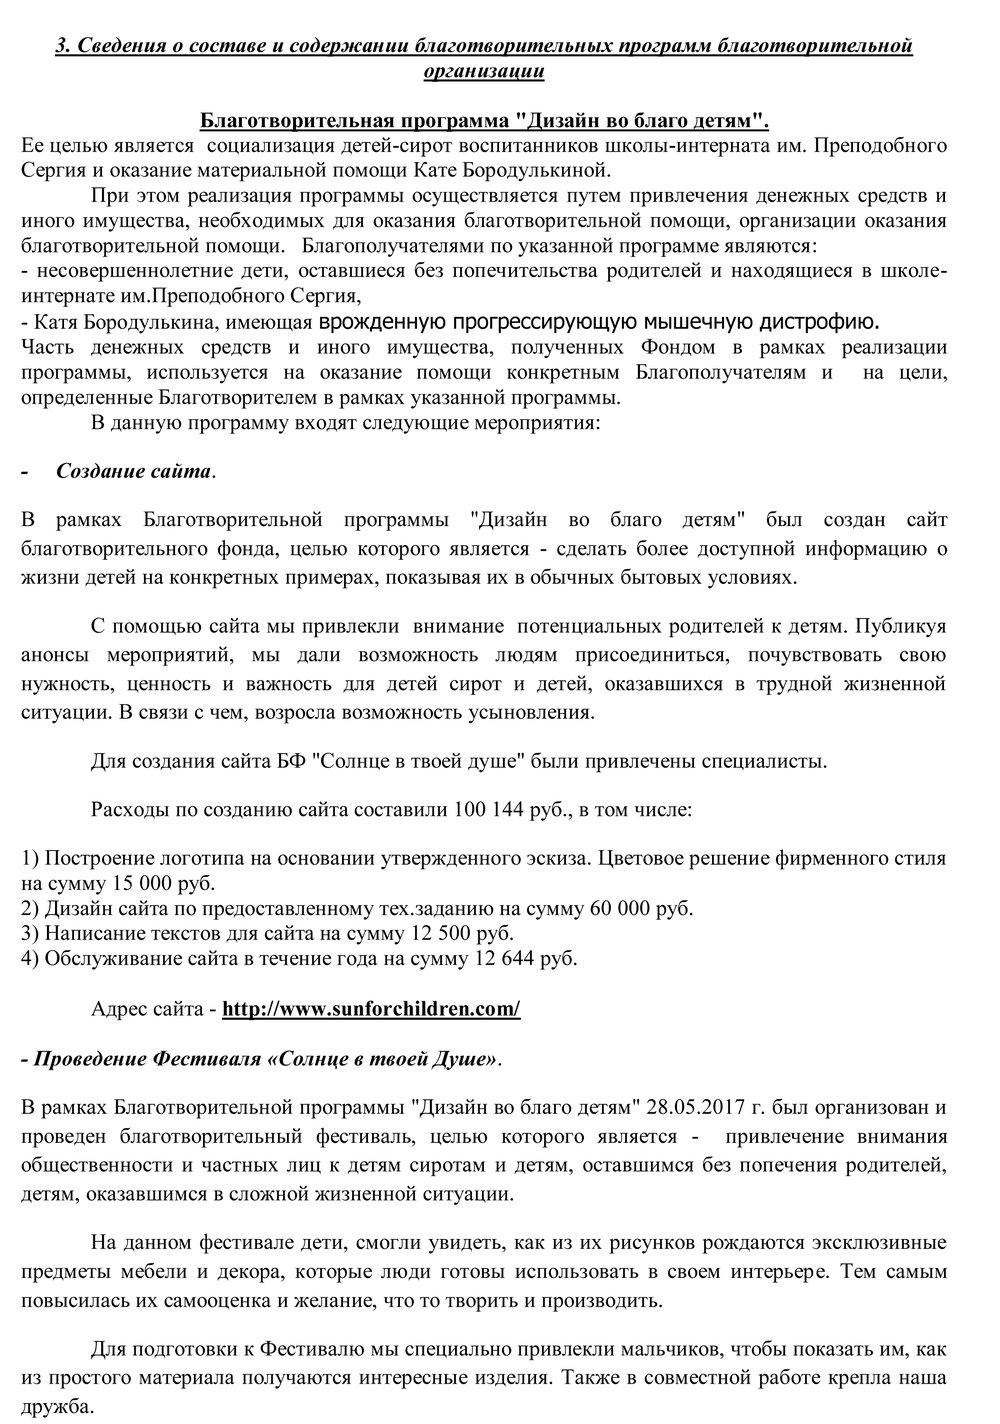 Отчет 2017 уточ2.jpg